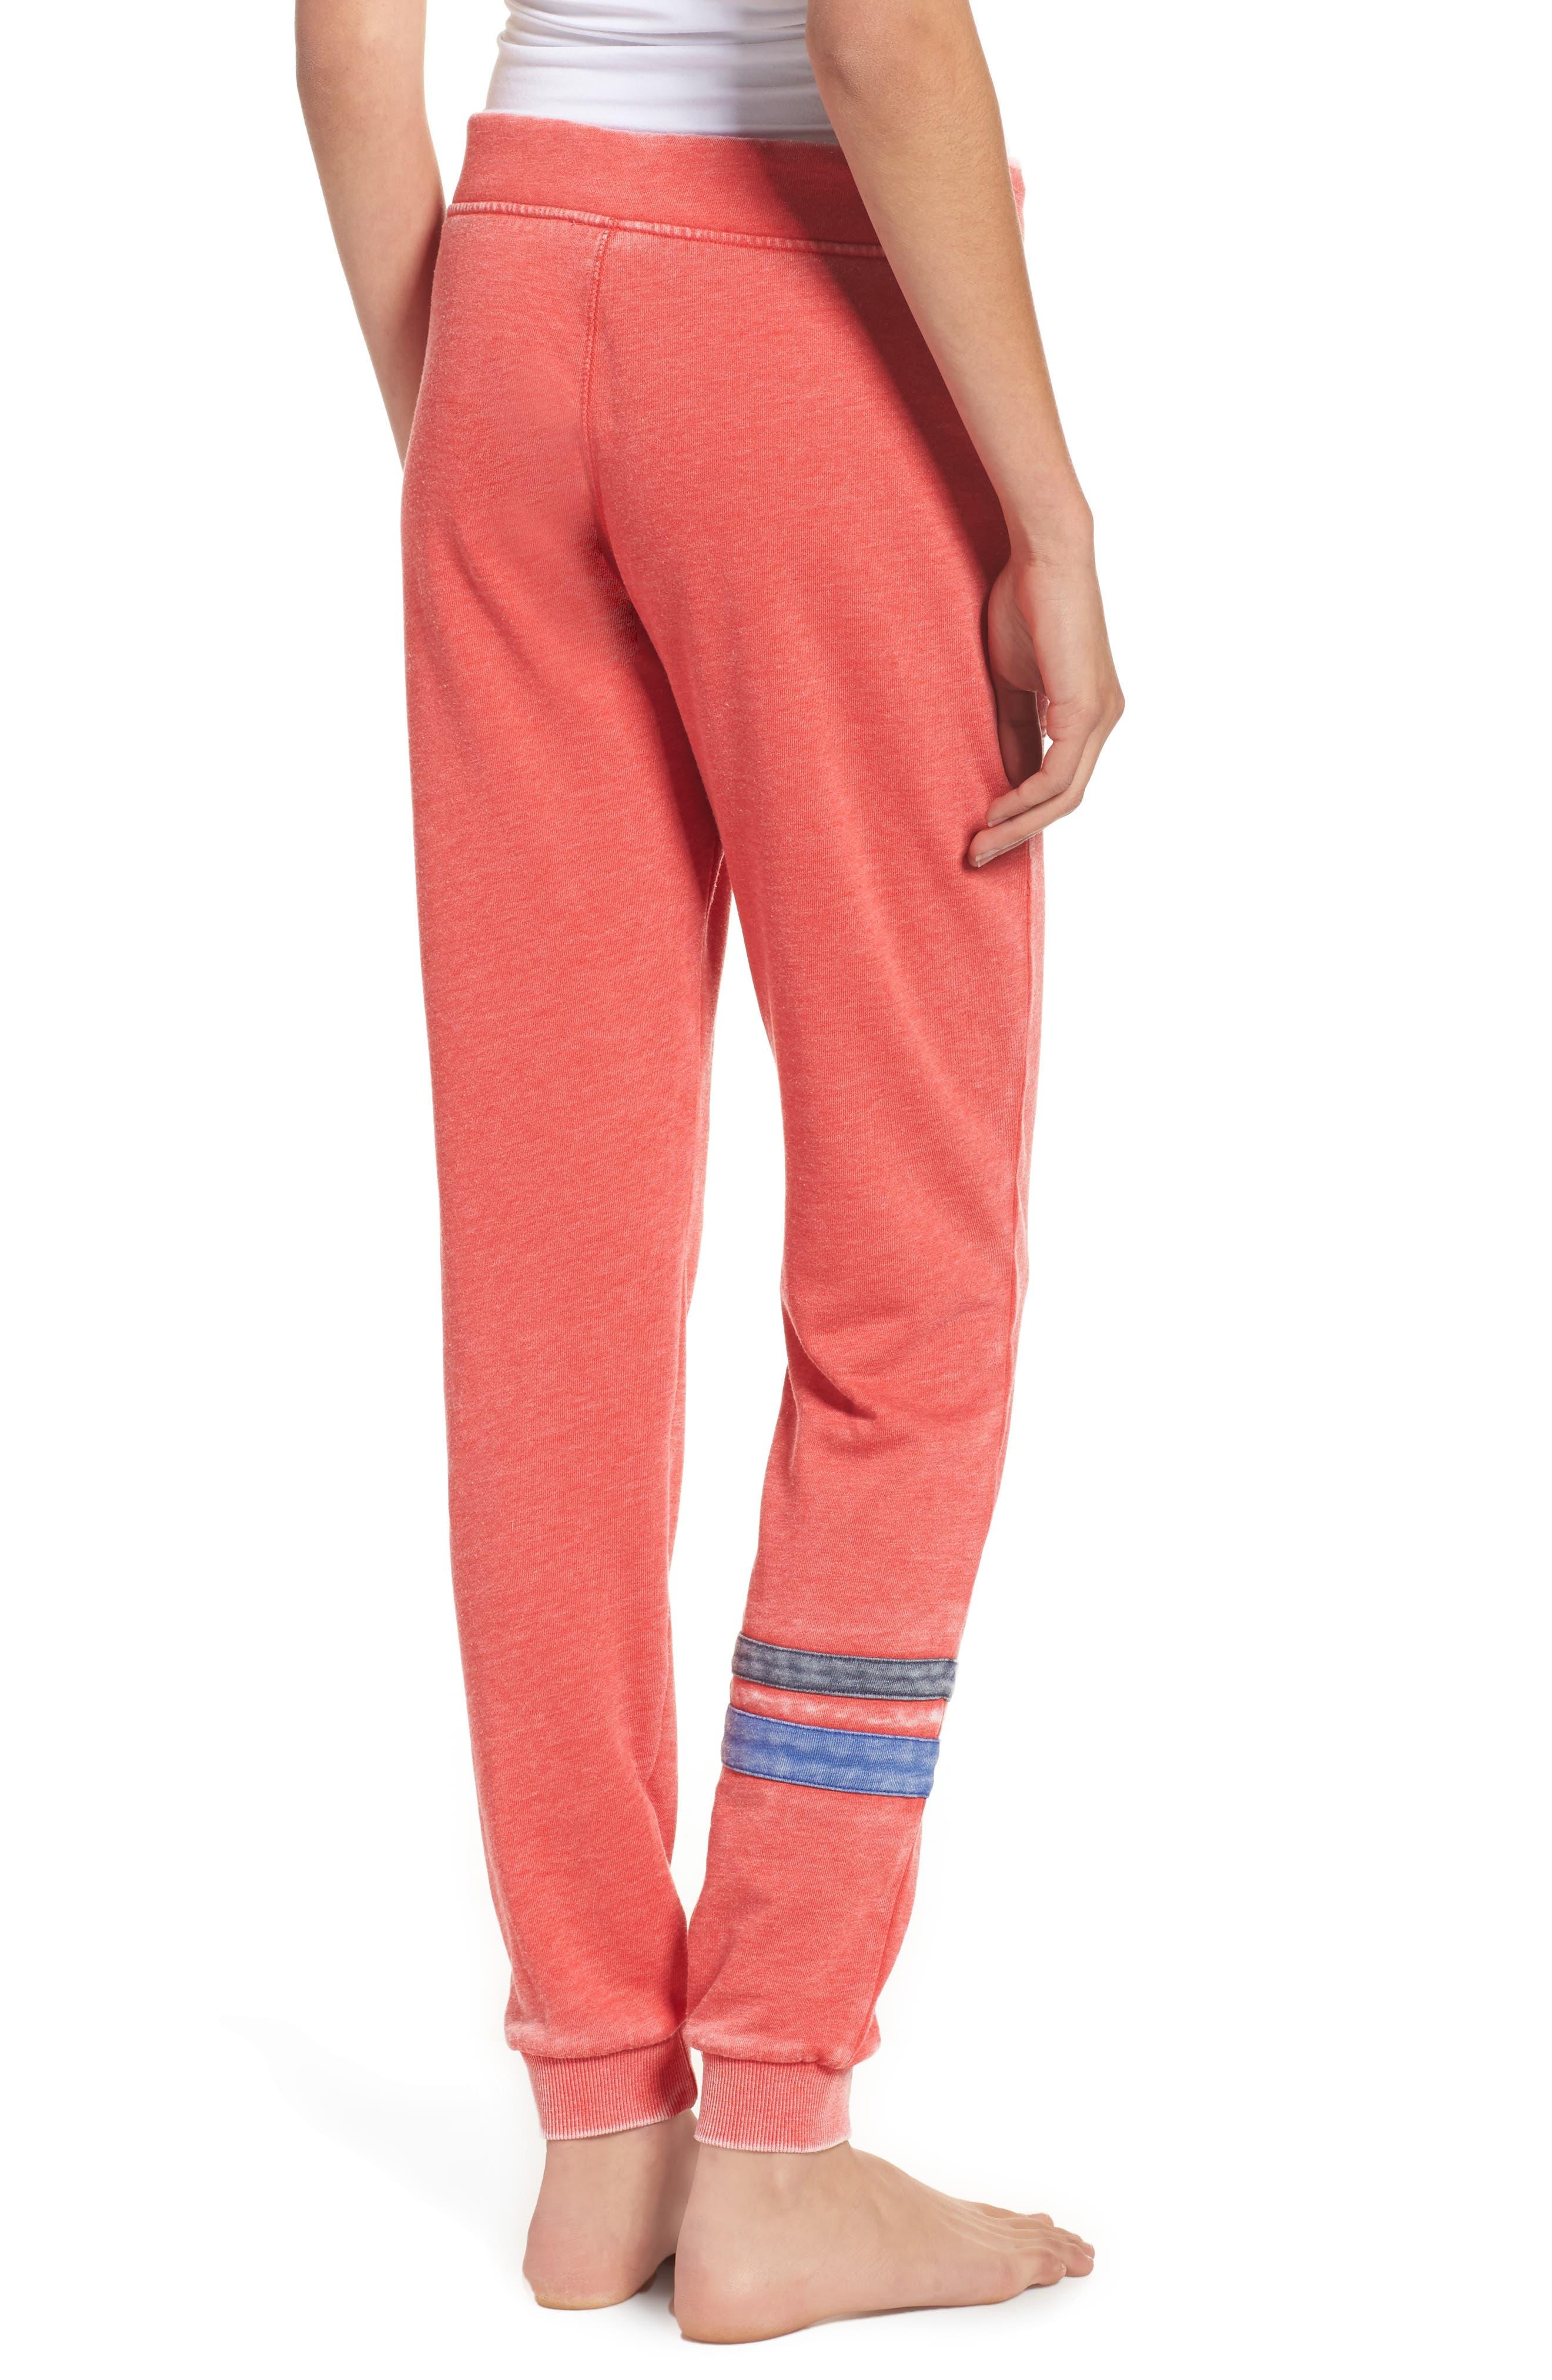 Long Weekend Lounge Jogger Pants,                             Alternate thumbnail 2, color,                             Red Bloom/ Dark Navy/ Blue